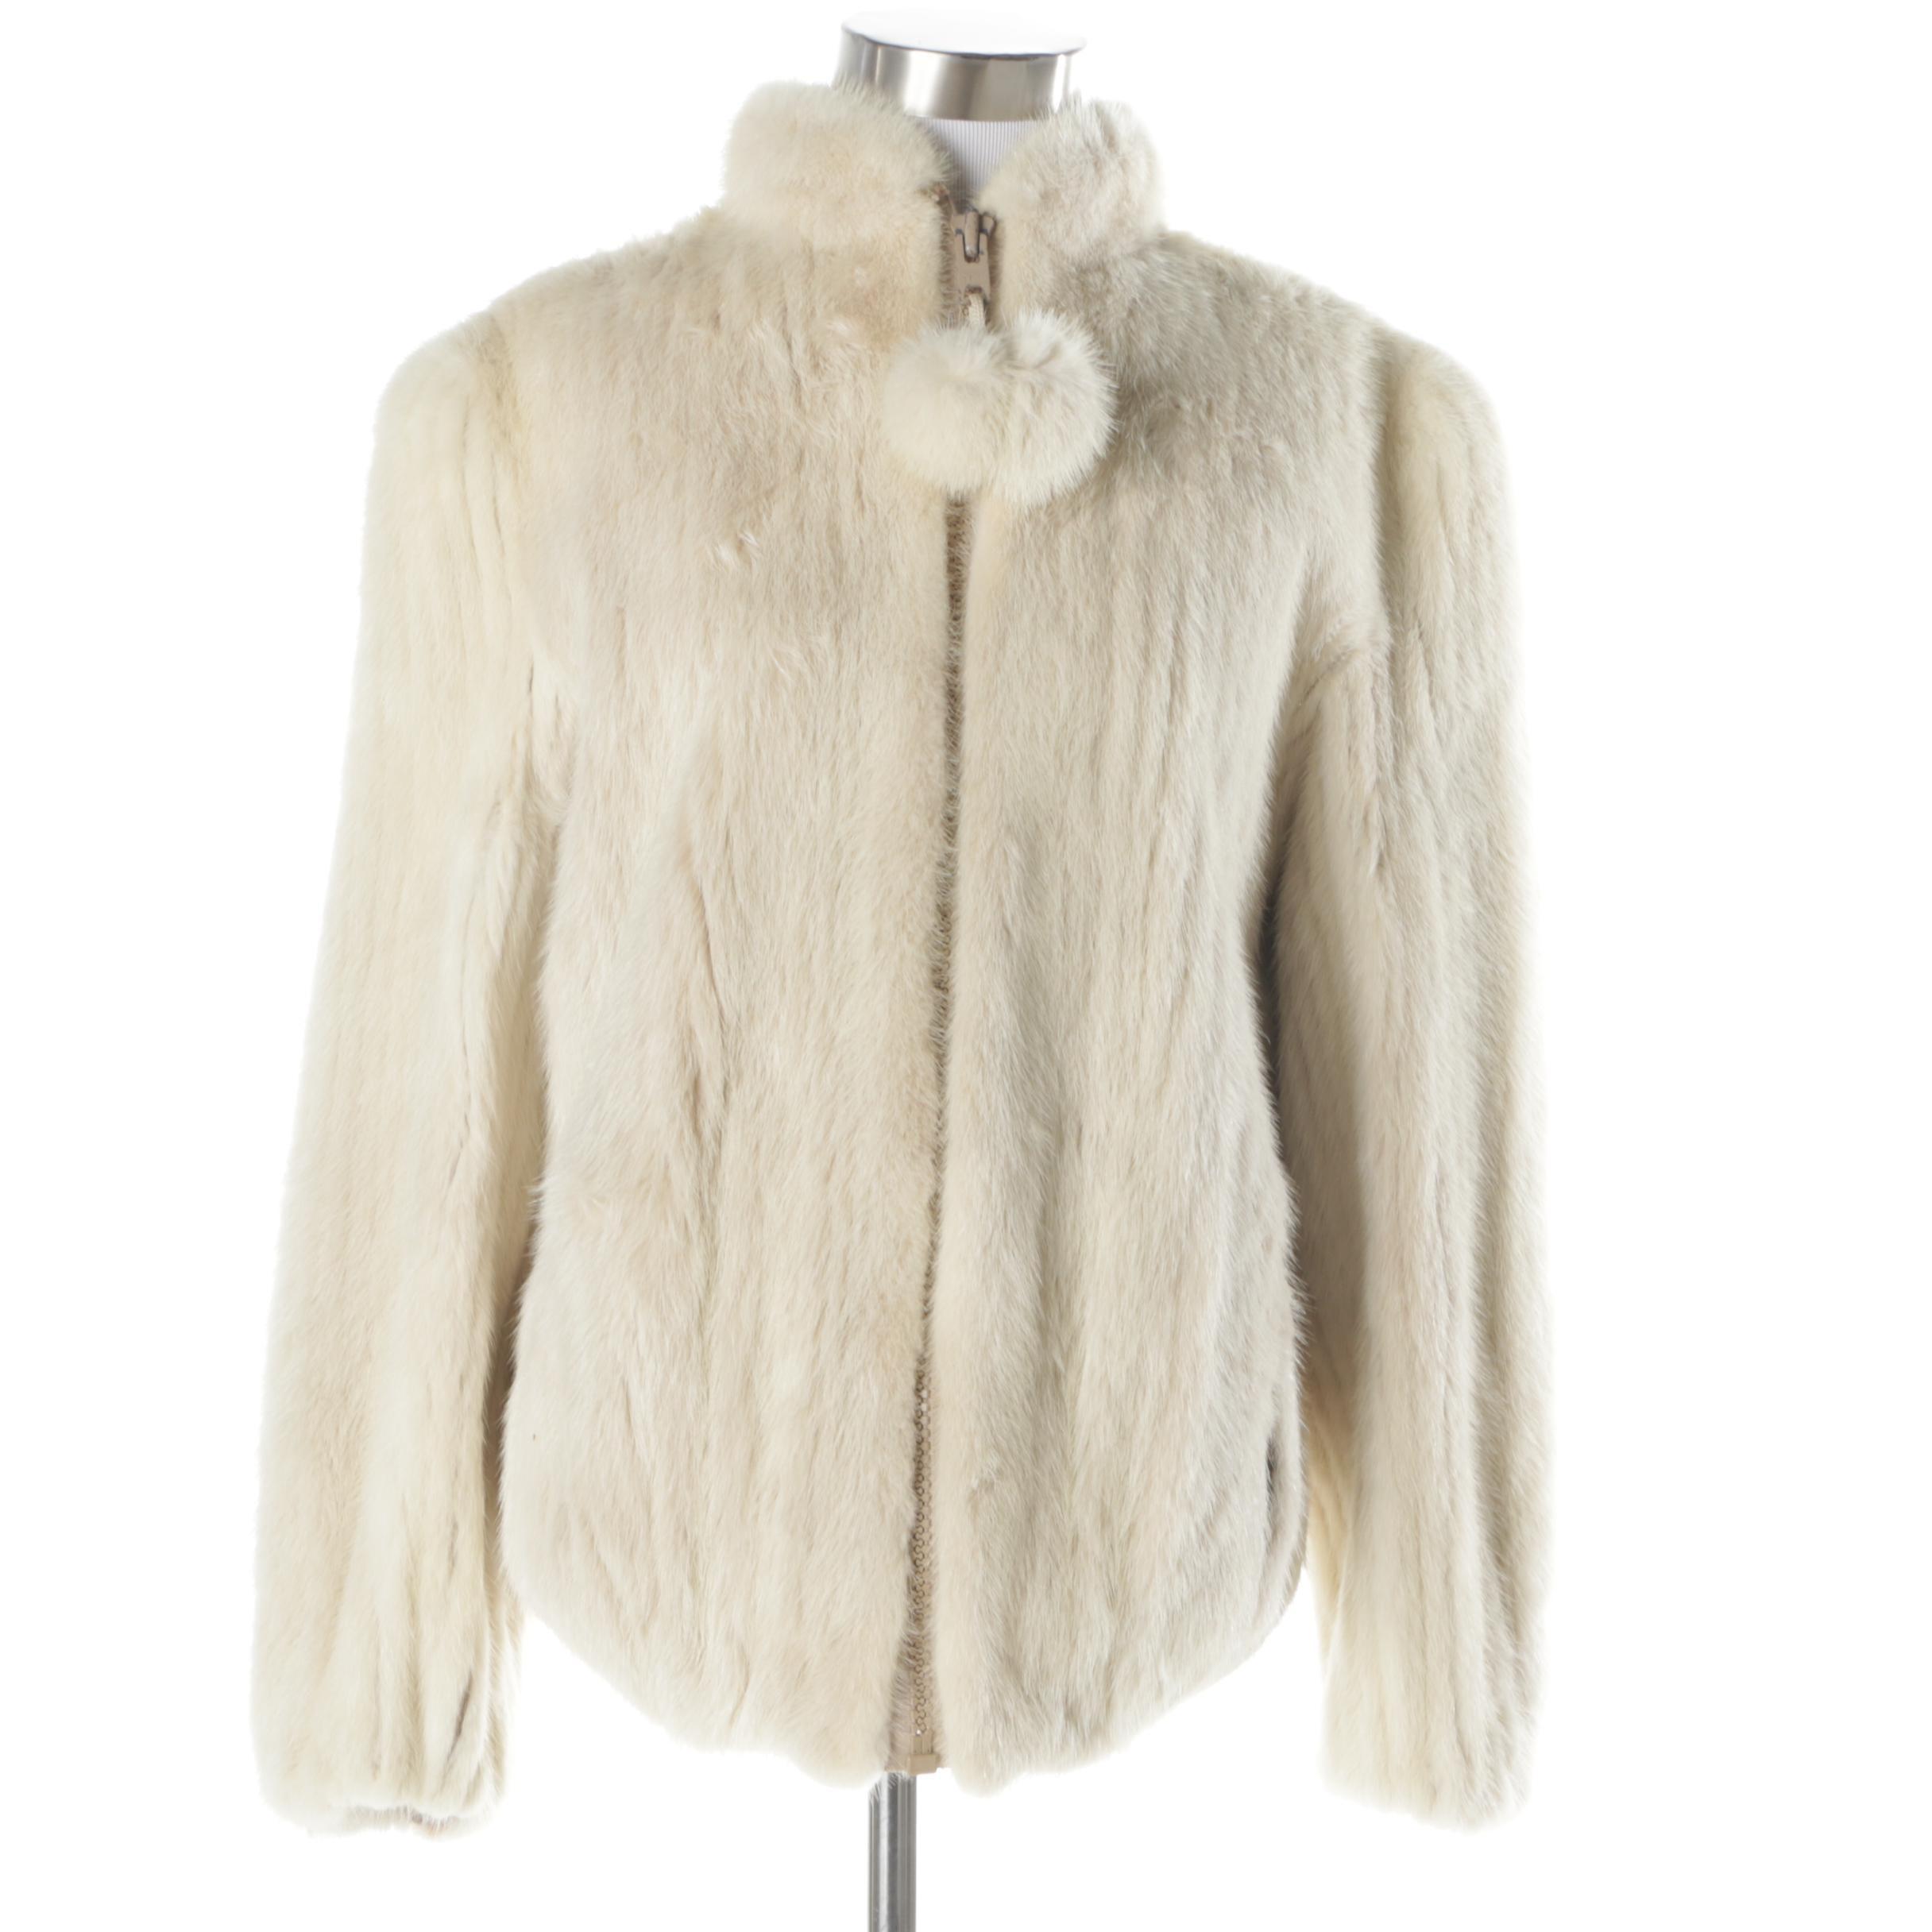 Women's Vintage Yudofsky Furriers Mink Fur Jacket